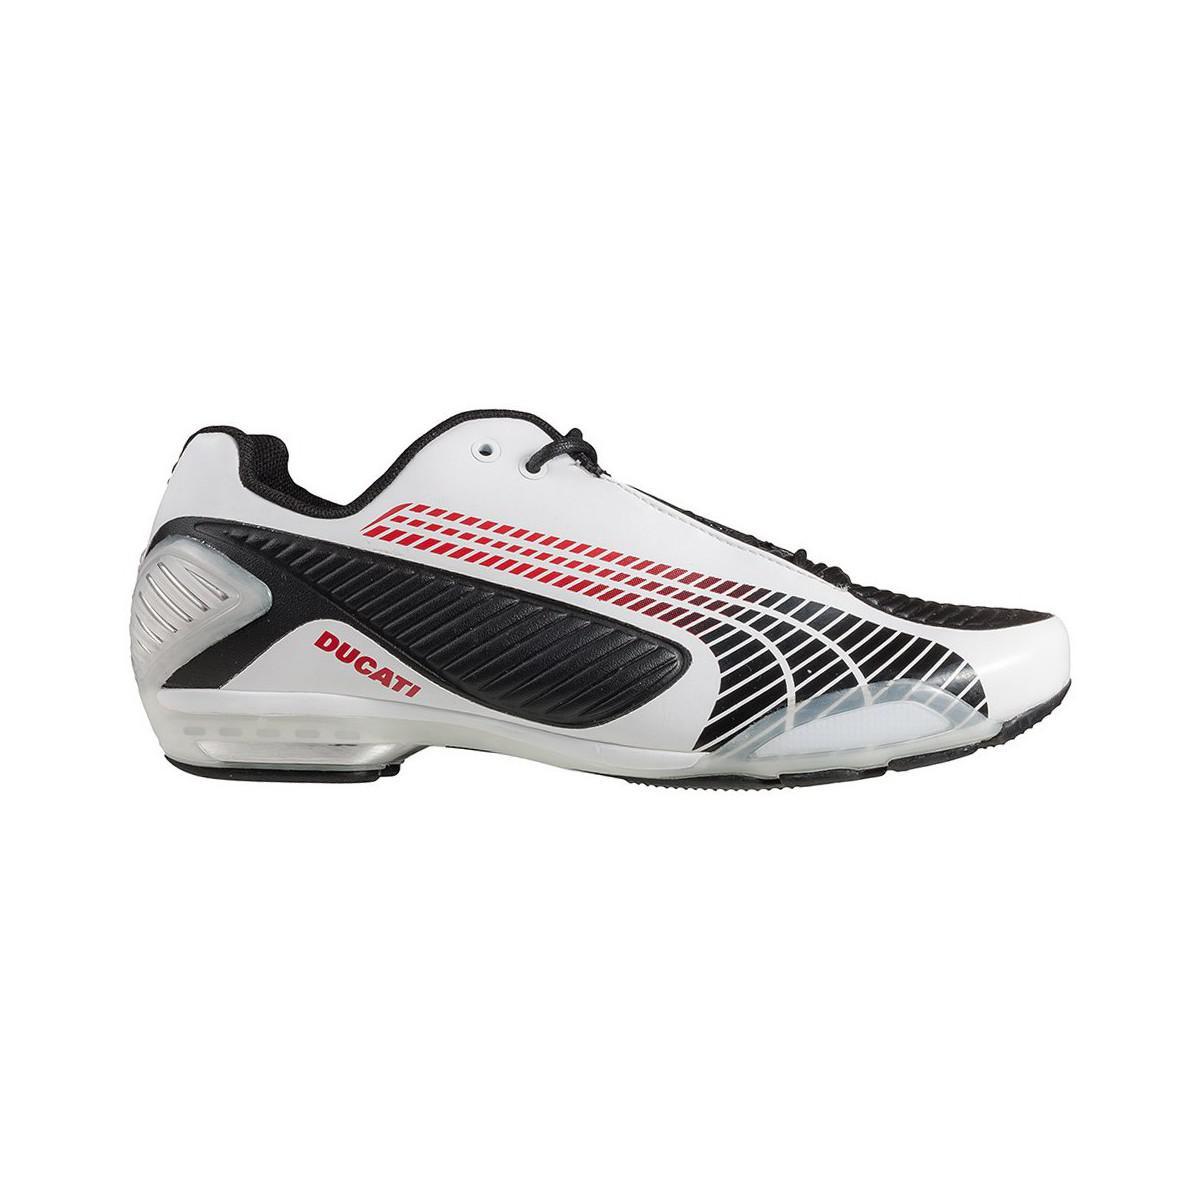 ad51b62a8aef PUMA Testastretta Iii Ducati Men s Shoes (trainers) In Black in ...